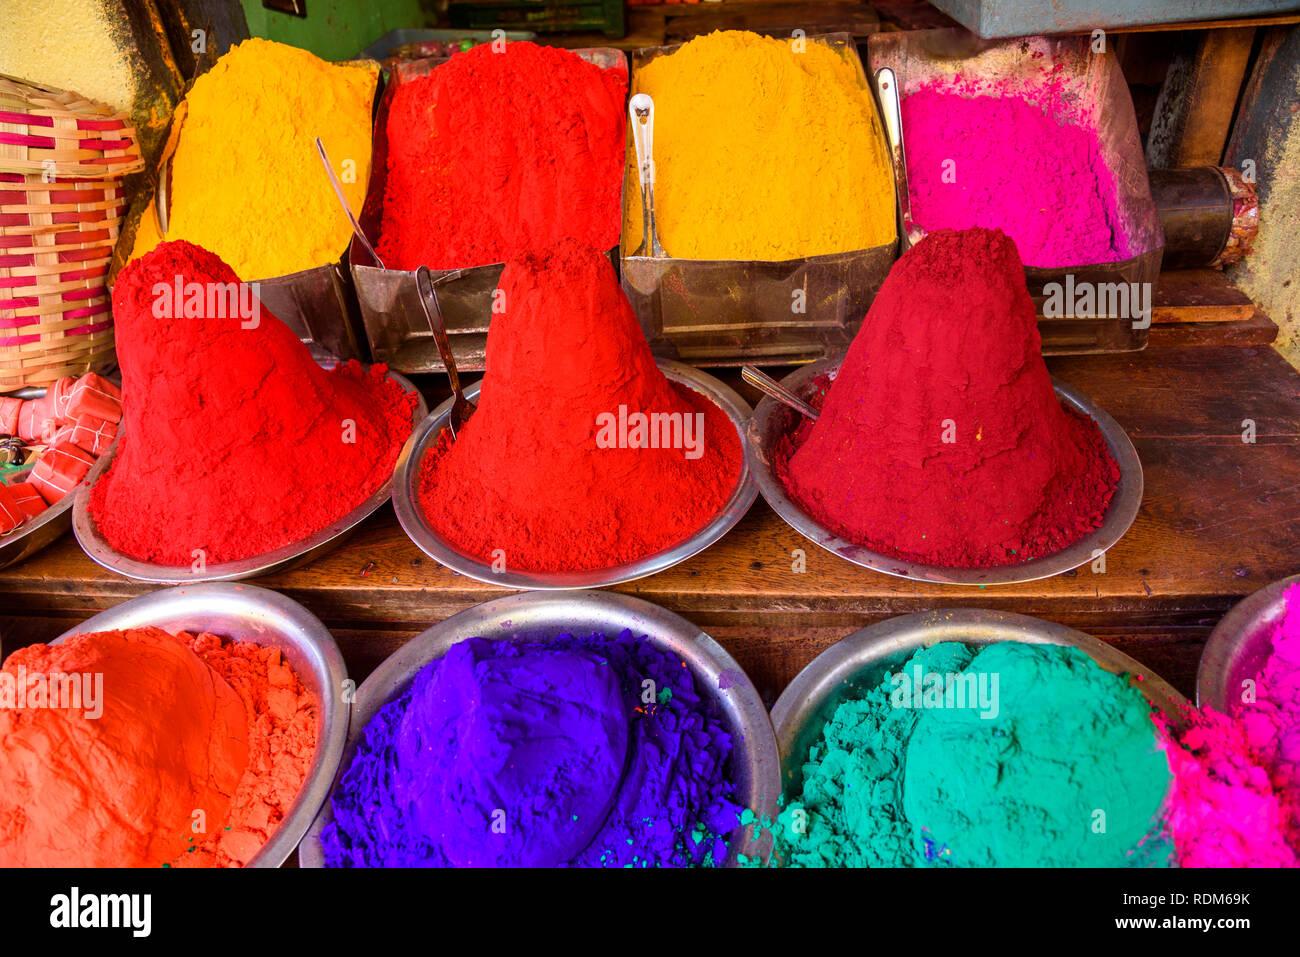 Bancarella vendendo polvere colorata per bindis e faccia tilaka vernice, mercato Devaraja, Mysore. Mysuru, Karnataka, India Immagini Stock